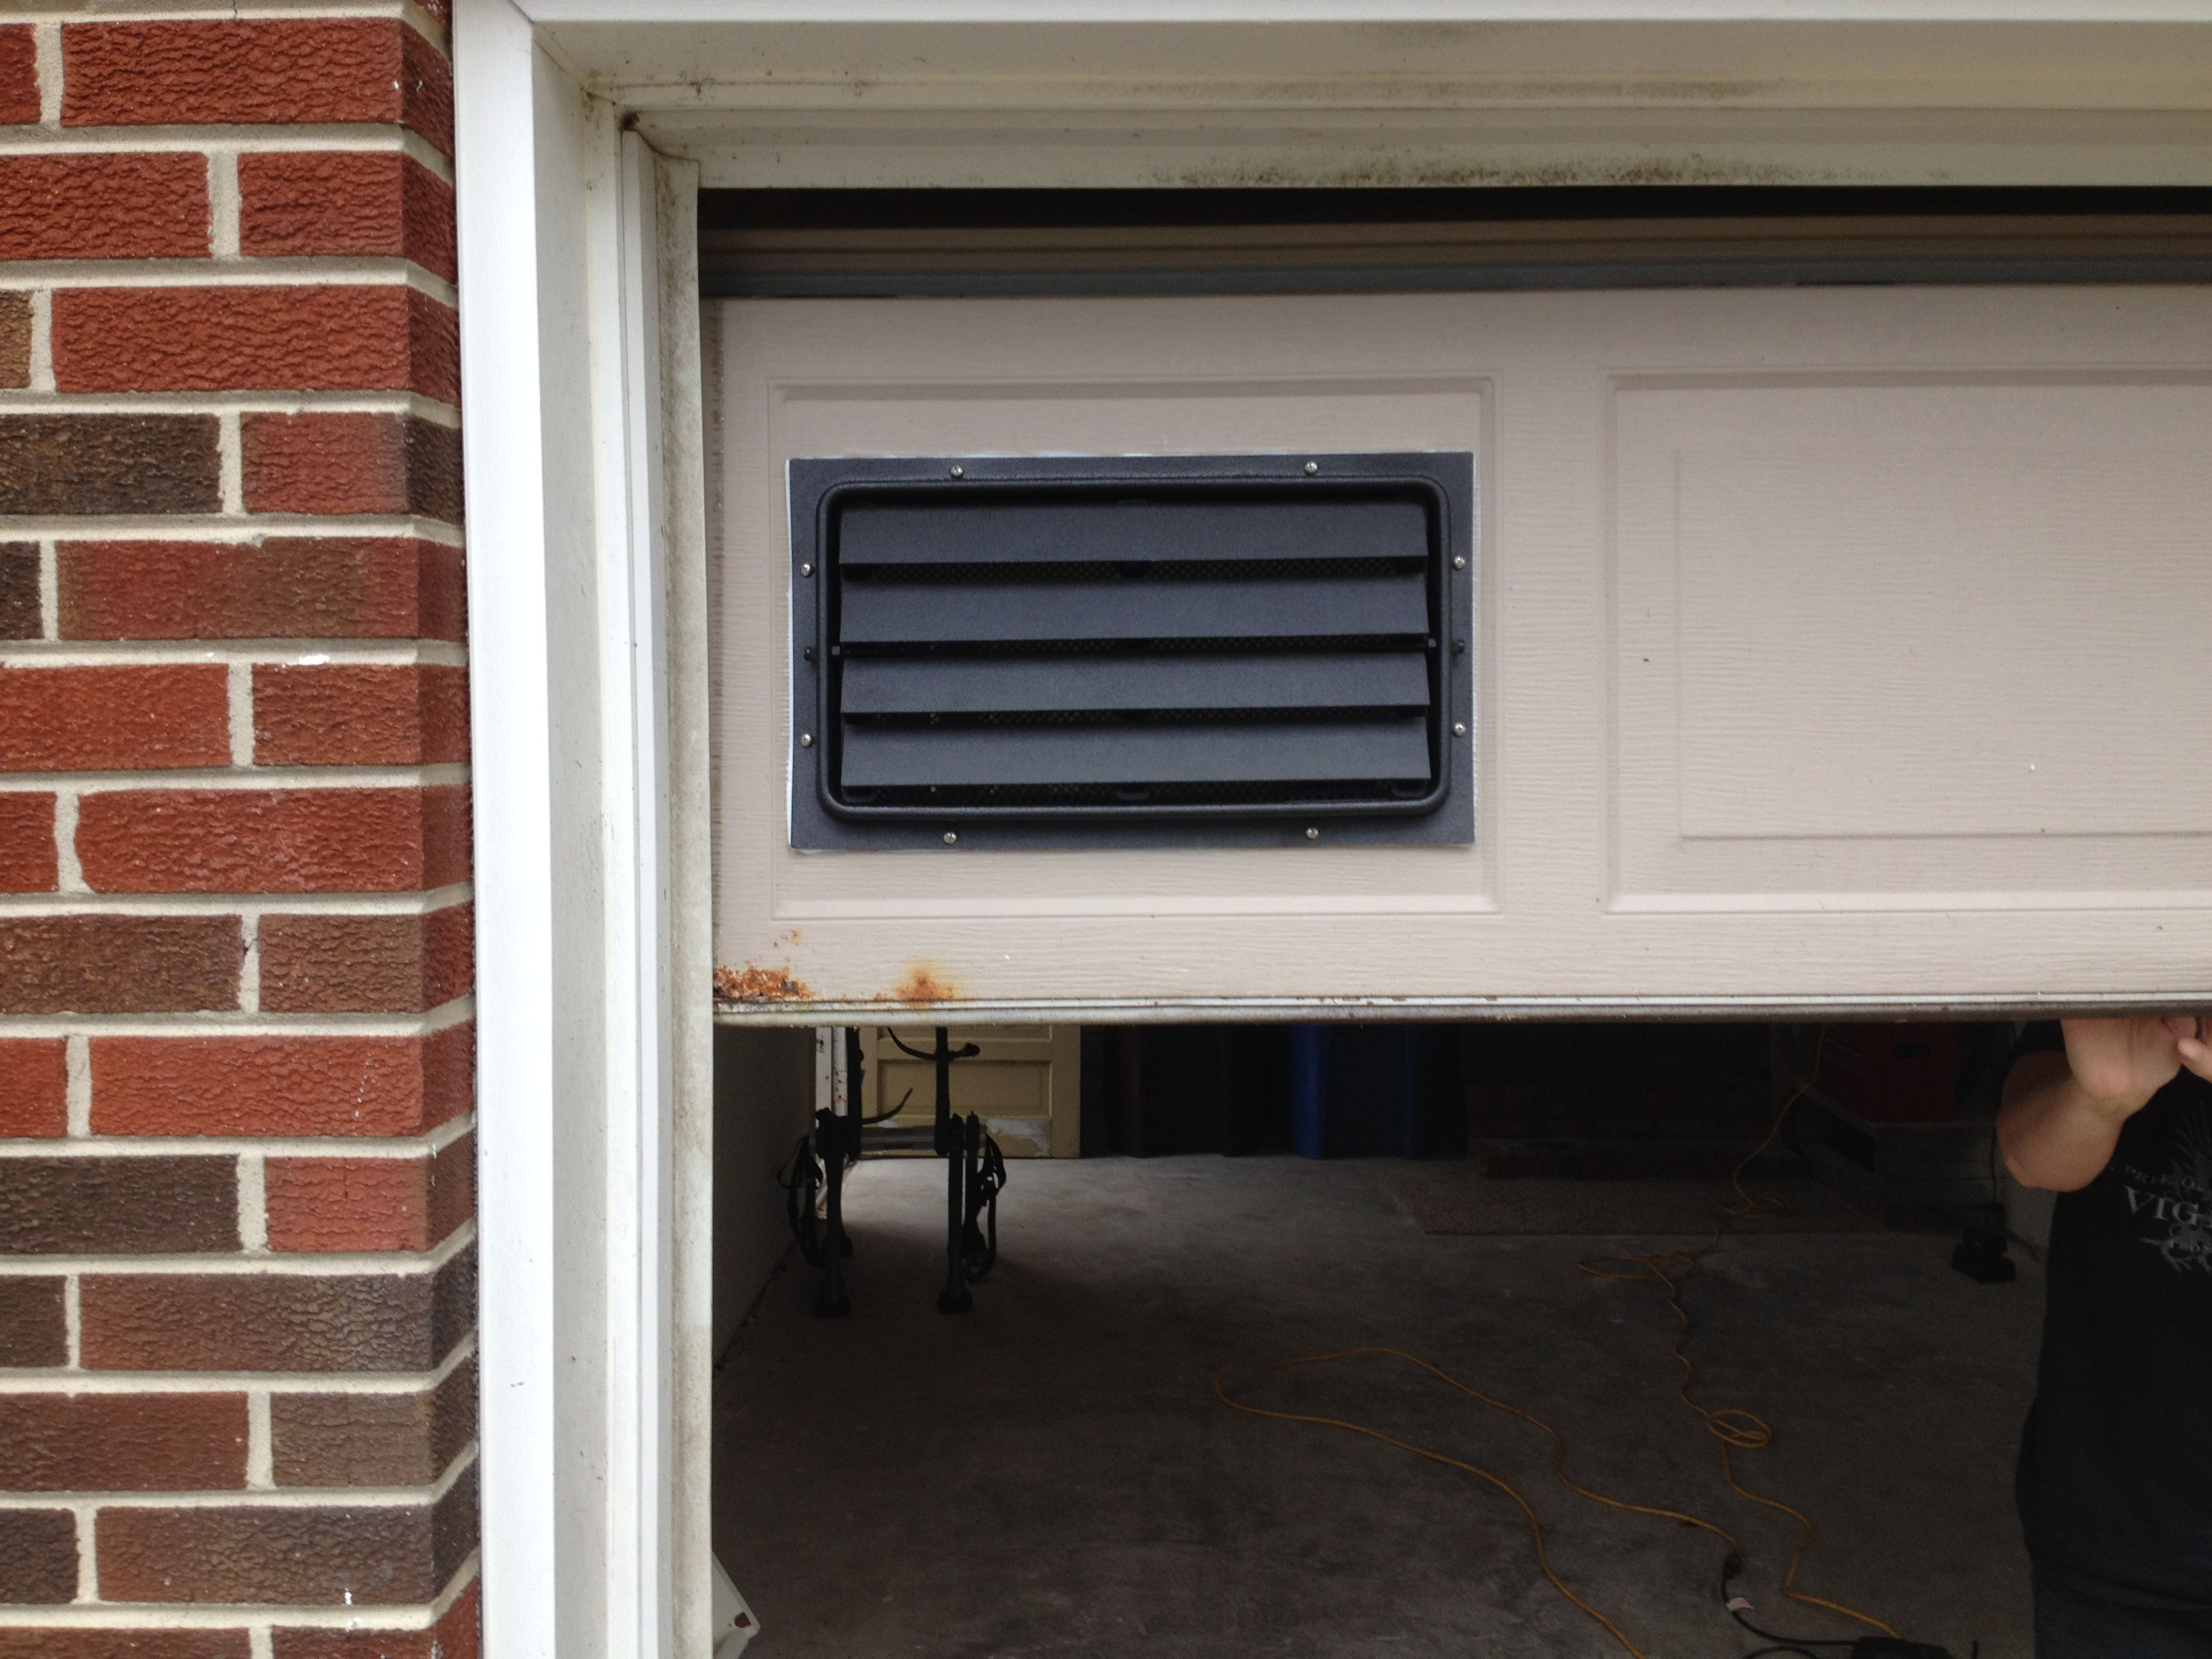 Our 8x16 Engineered Flood Vent With Trim Sleeve Installed In A Garage Door In Virginia Beach Va Flood Vents Door Installation Crawlspace